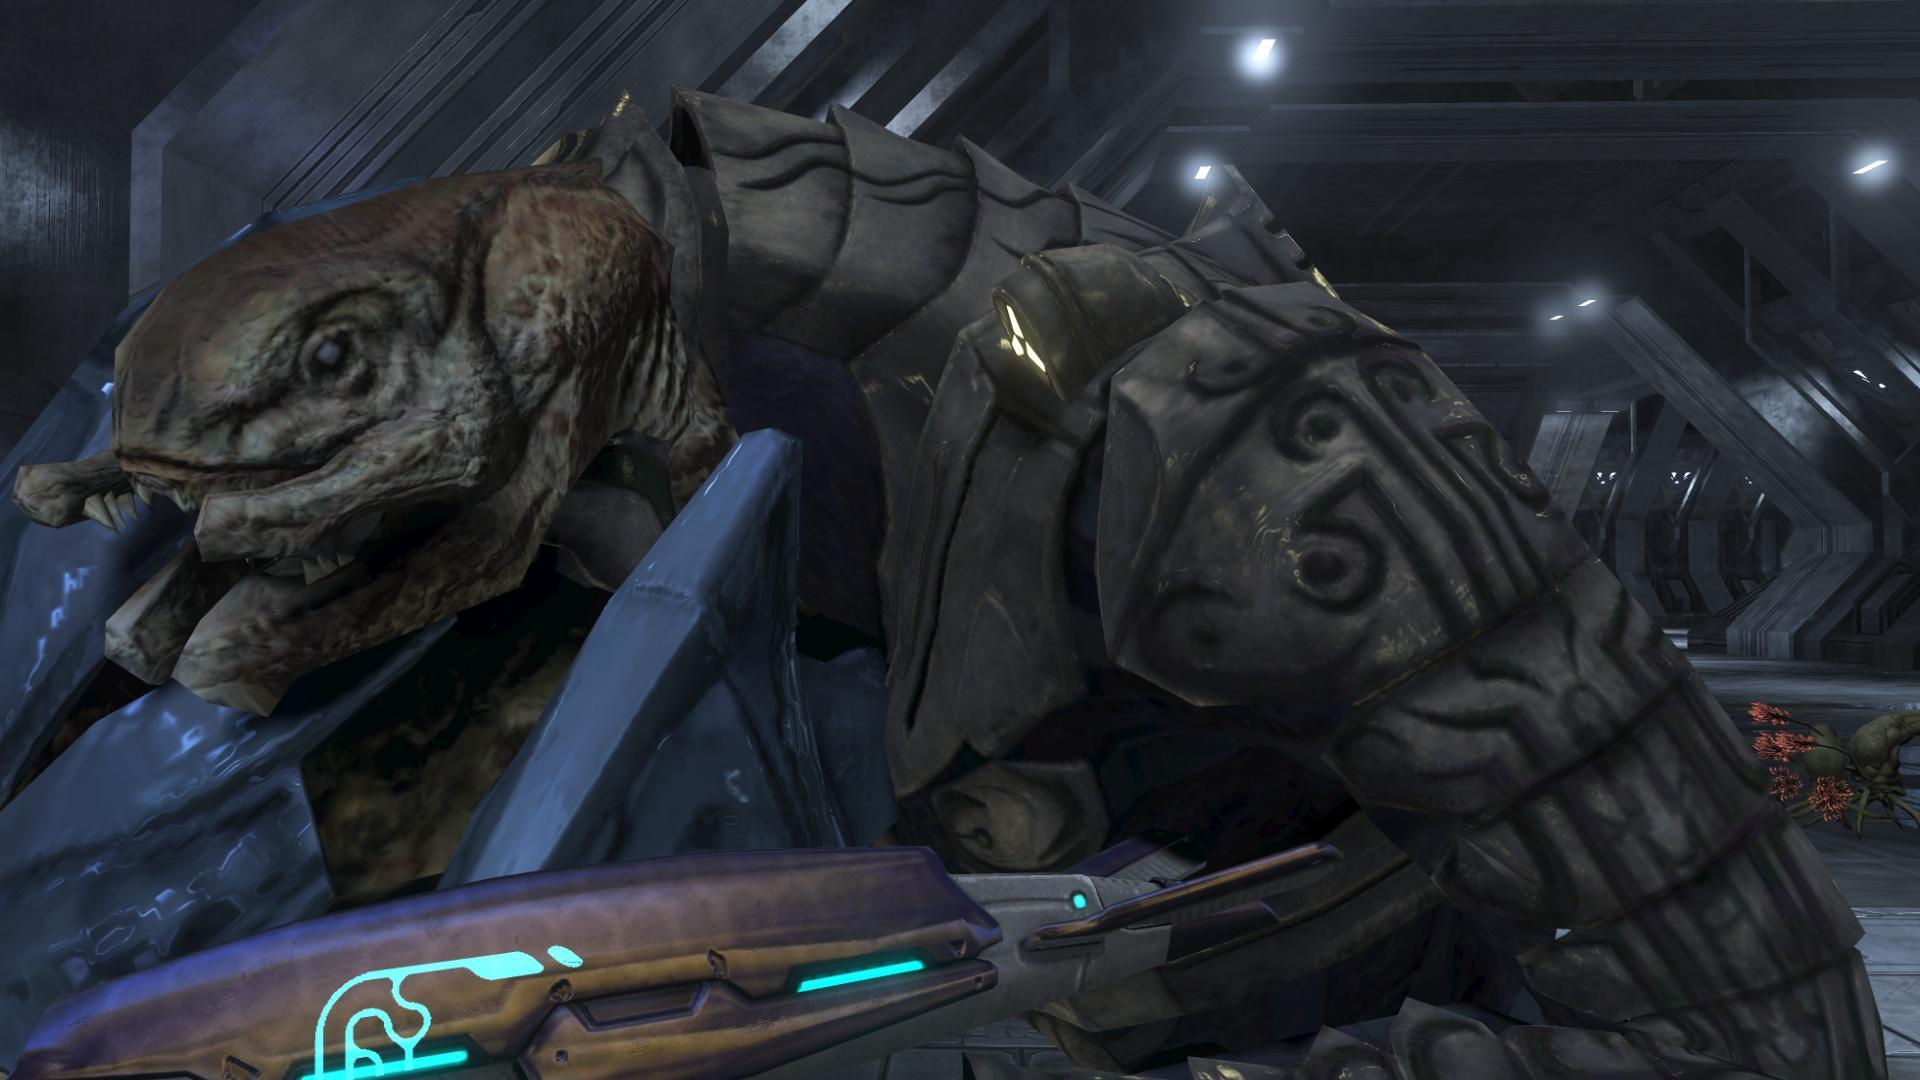 Res: 1920x1080, Halo 3 Screenshot Arbiter Thel Vadam